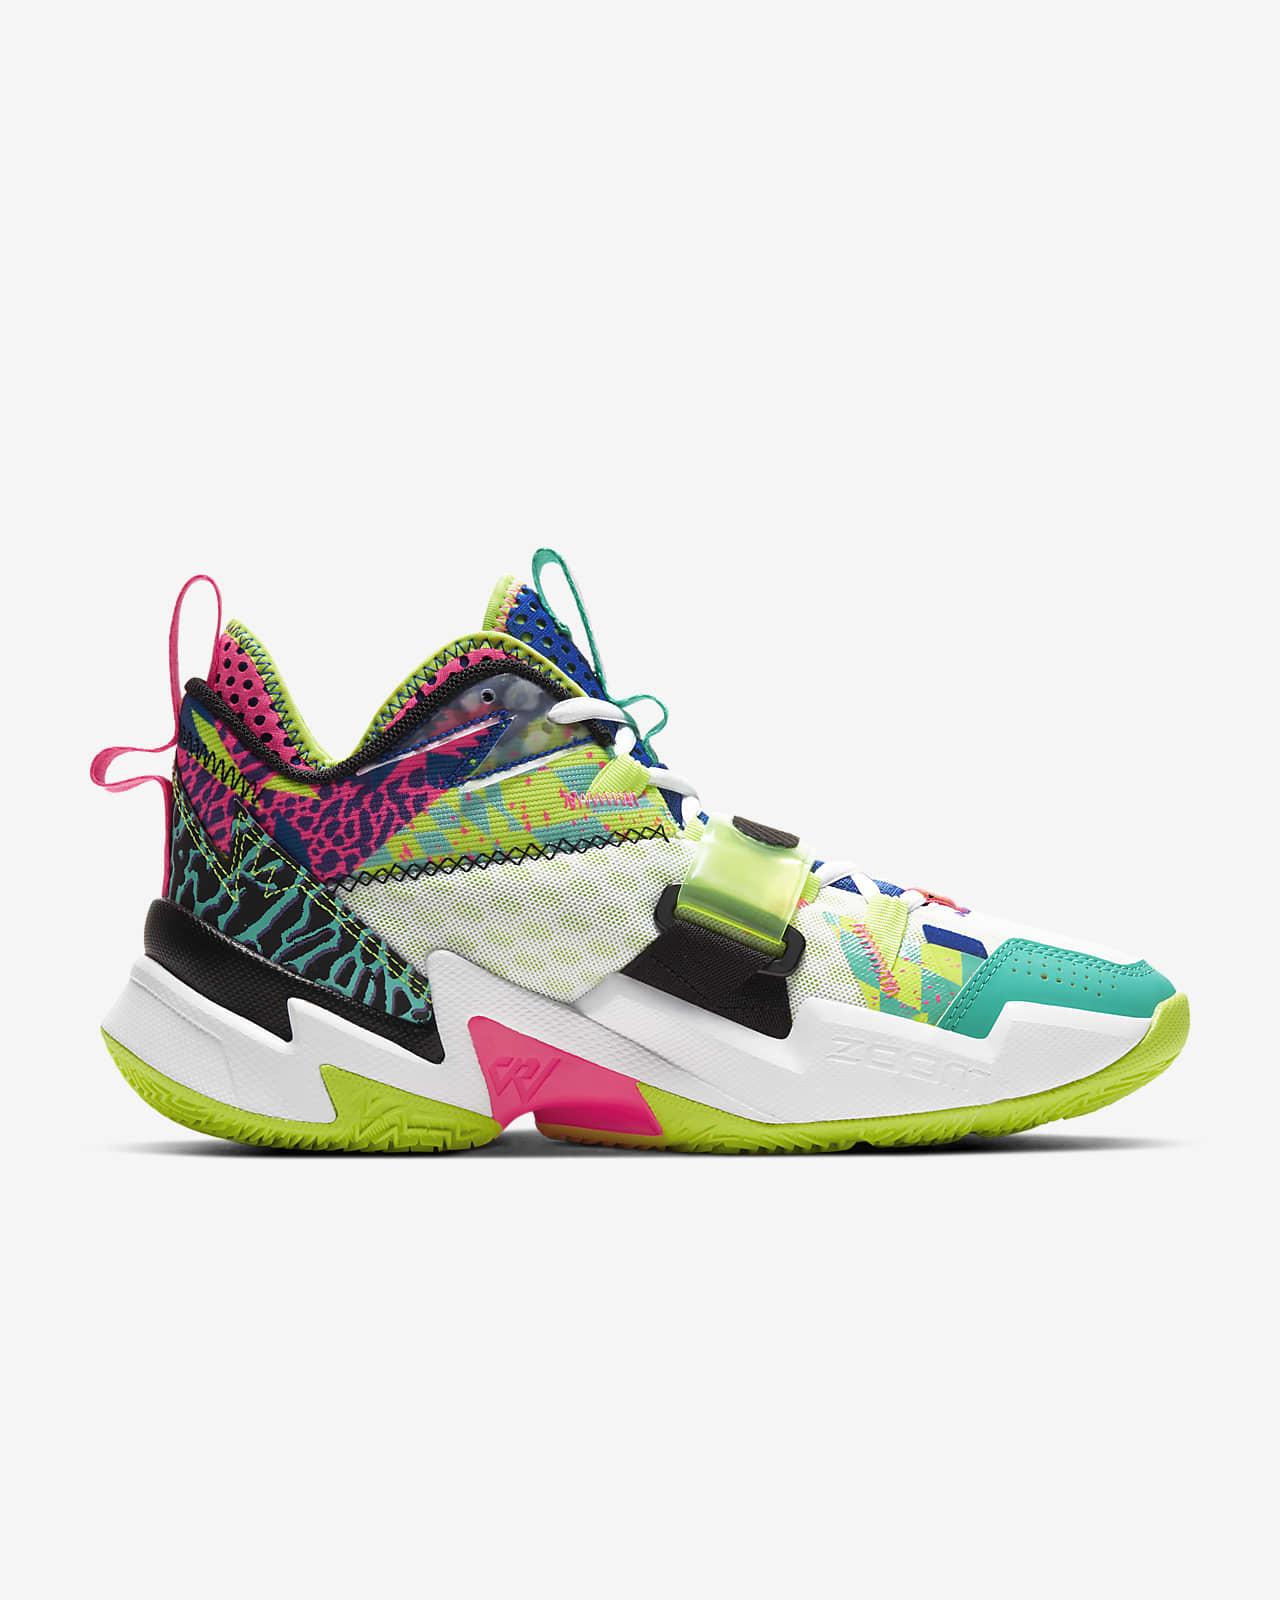 Zer0 3 Pf Men S Basketball Shoe Nike In